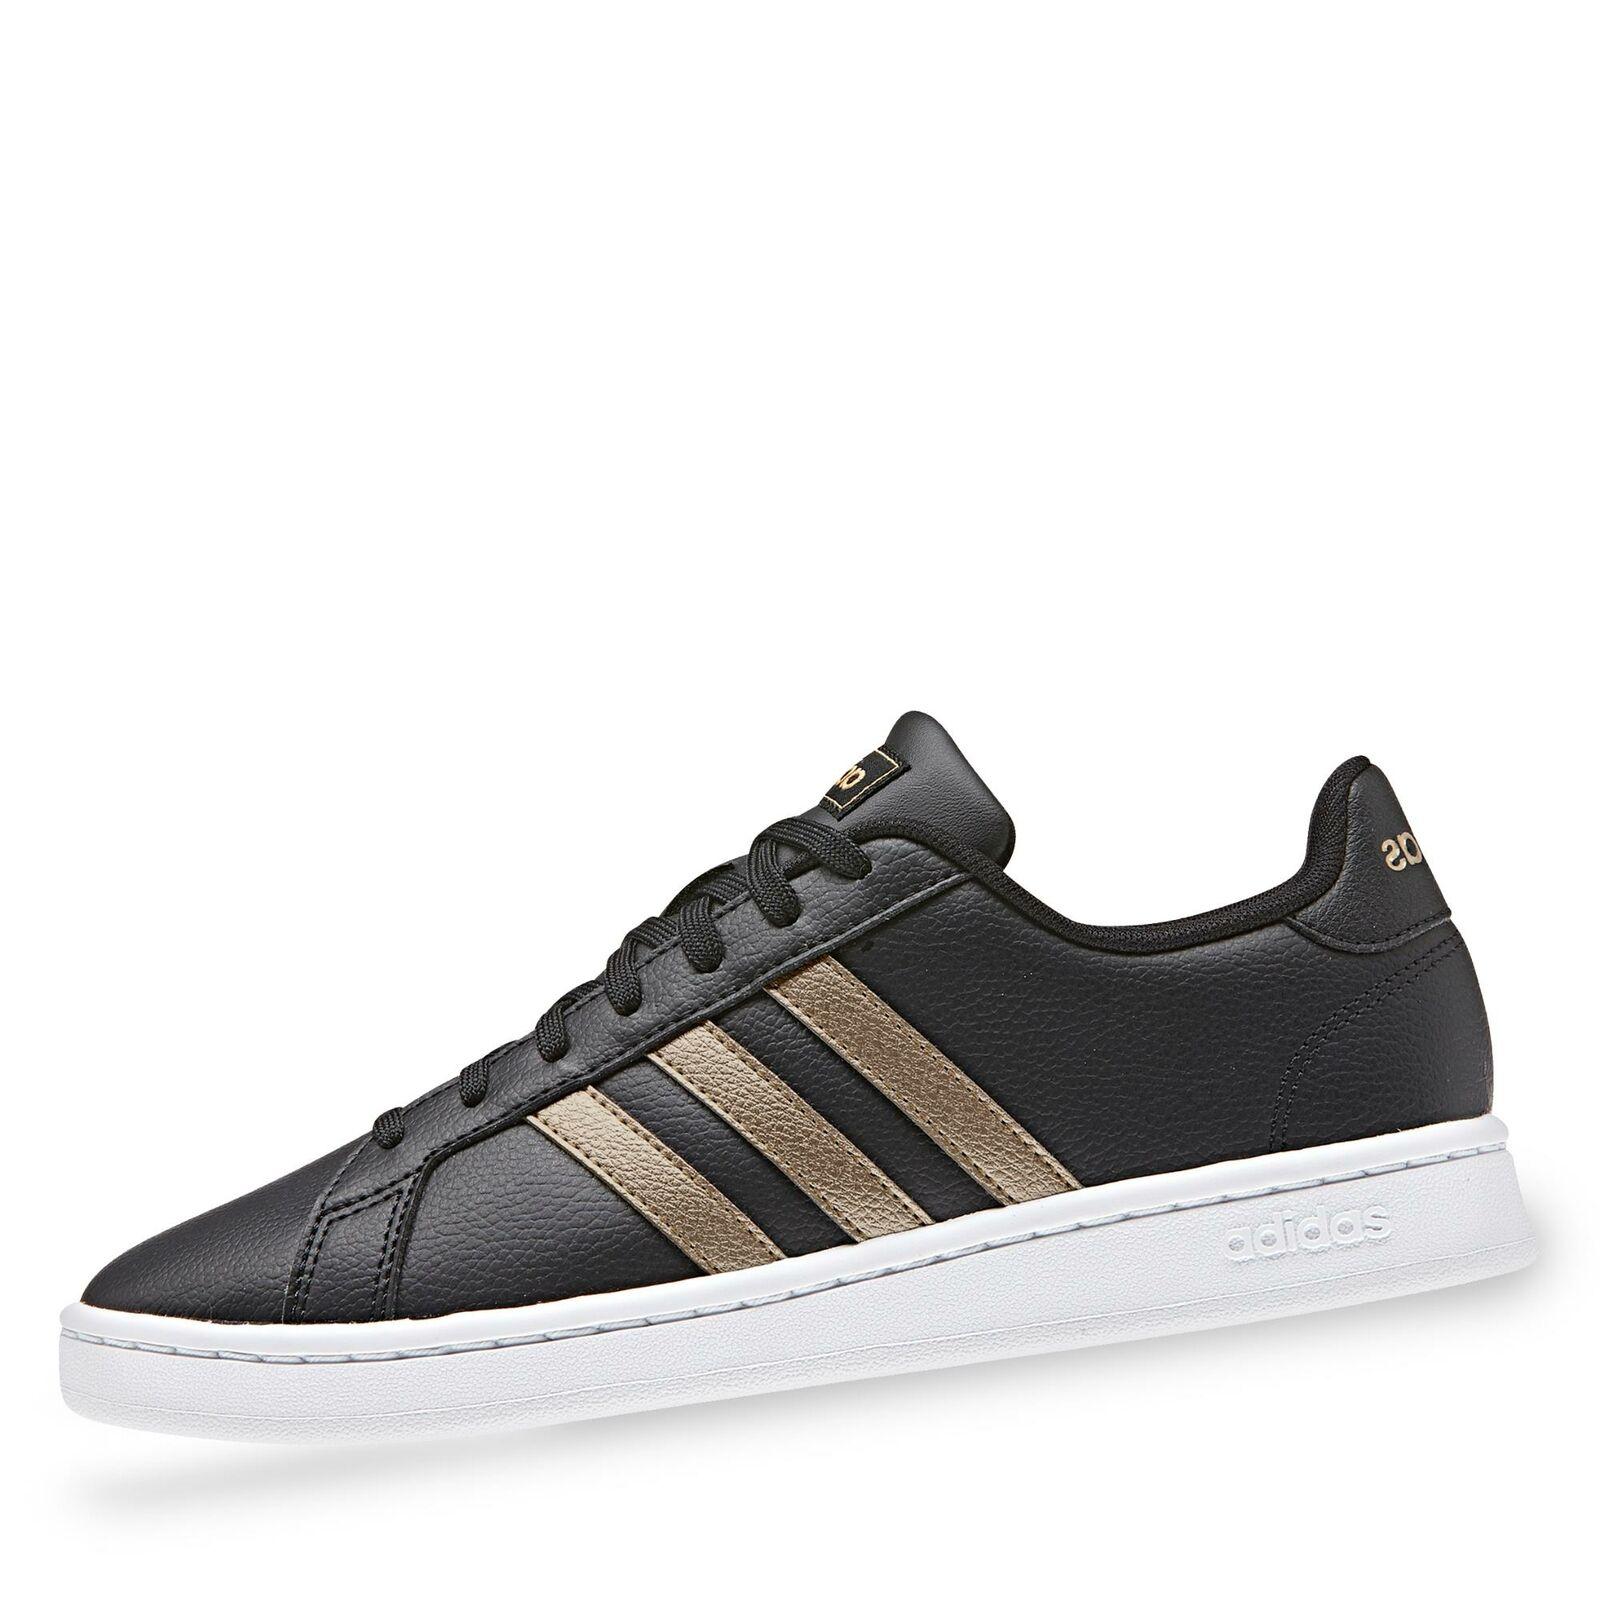 Adidas Grand Court Damen Turnschuhe low Halbschuhe Schnürschuhe Uni Schuhe schwarz